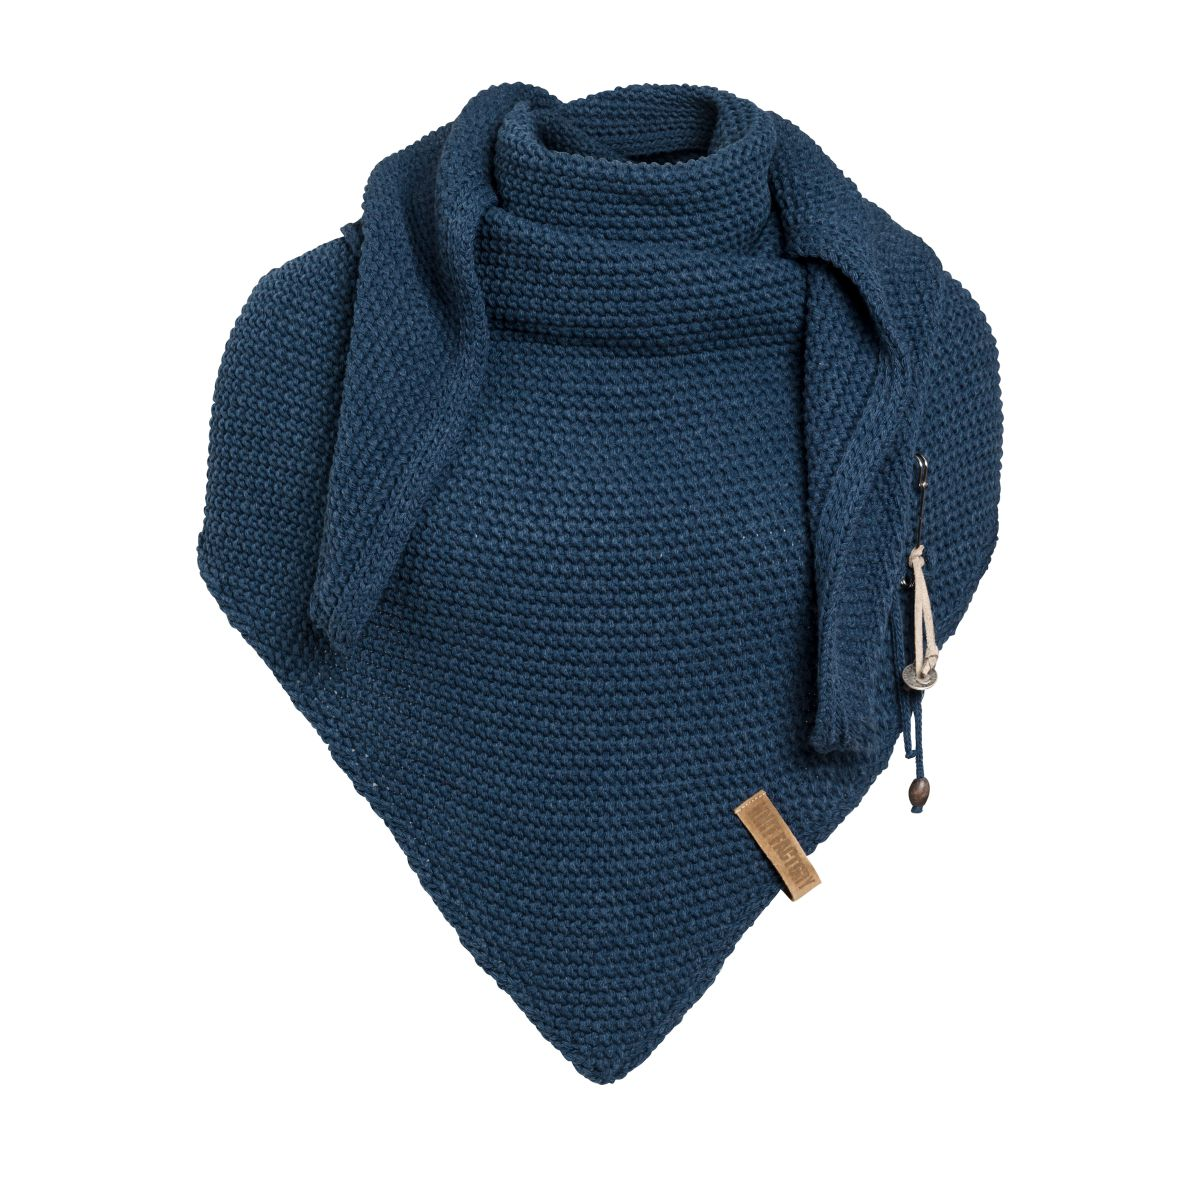 knit factory 1206013 coco omslagdoek jeans 1